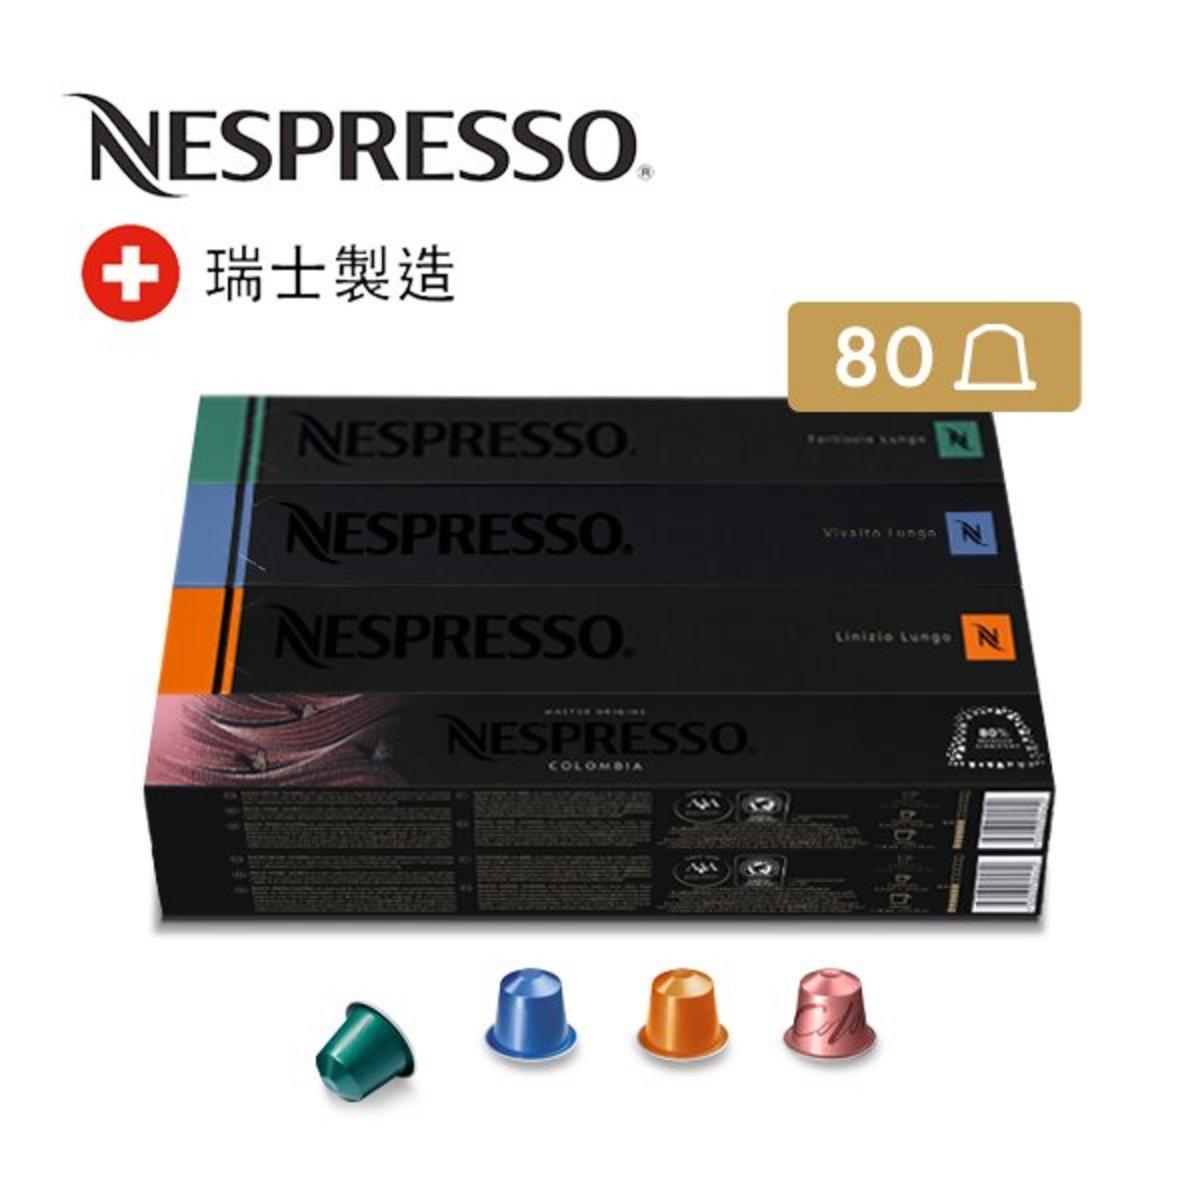 8-Sleeve Assortment (10 capsules per sleeve)